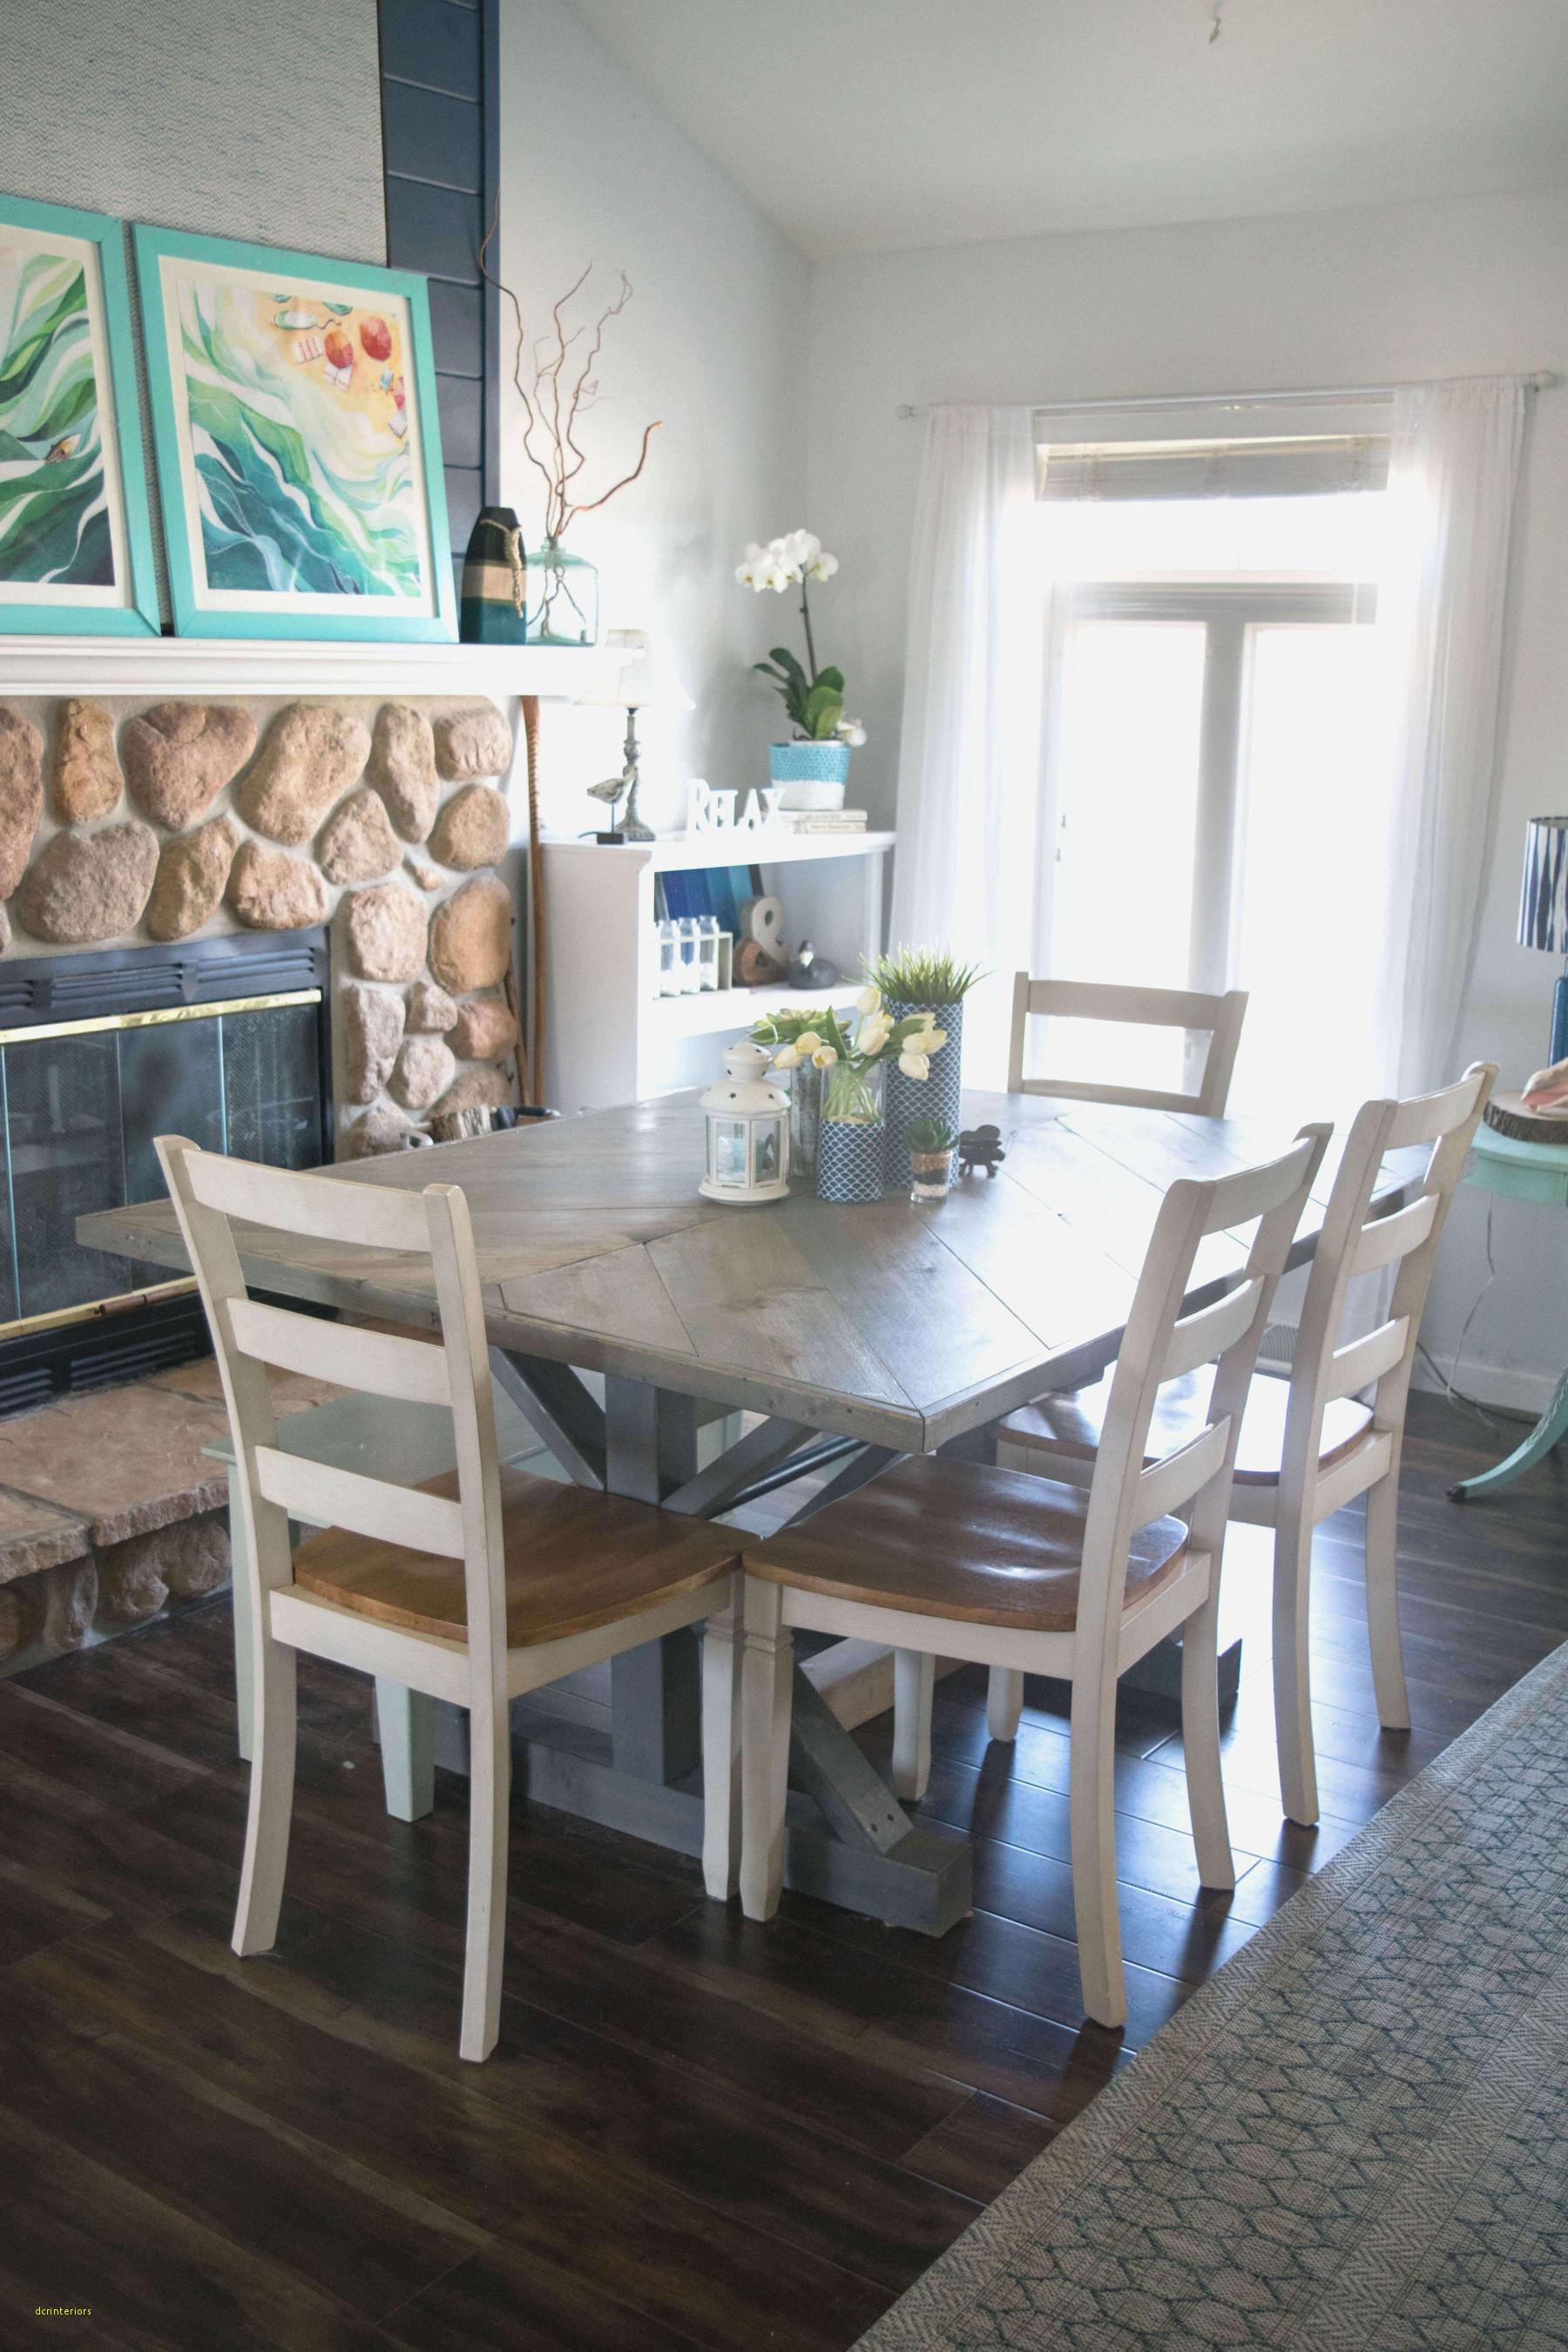 cheap hardwood flooring ideas of 39 terrific shabby chic decor decoration regarding dining decorating ideas new shabby chic living room ideas best decor chic decor chic decor 0d